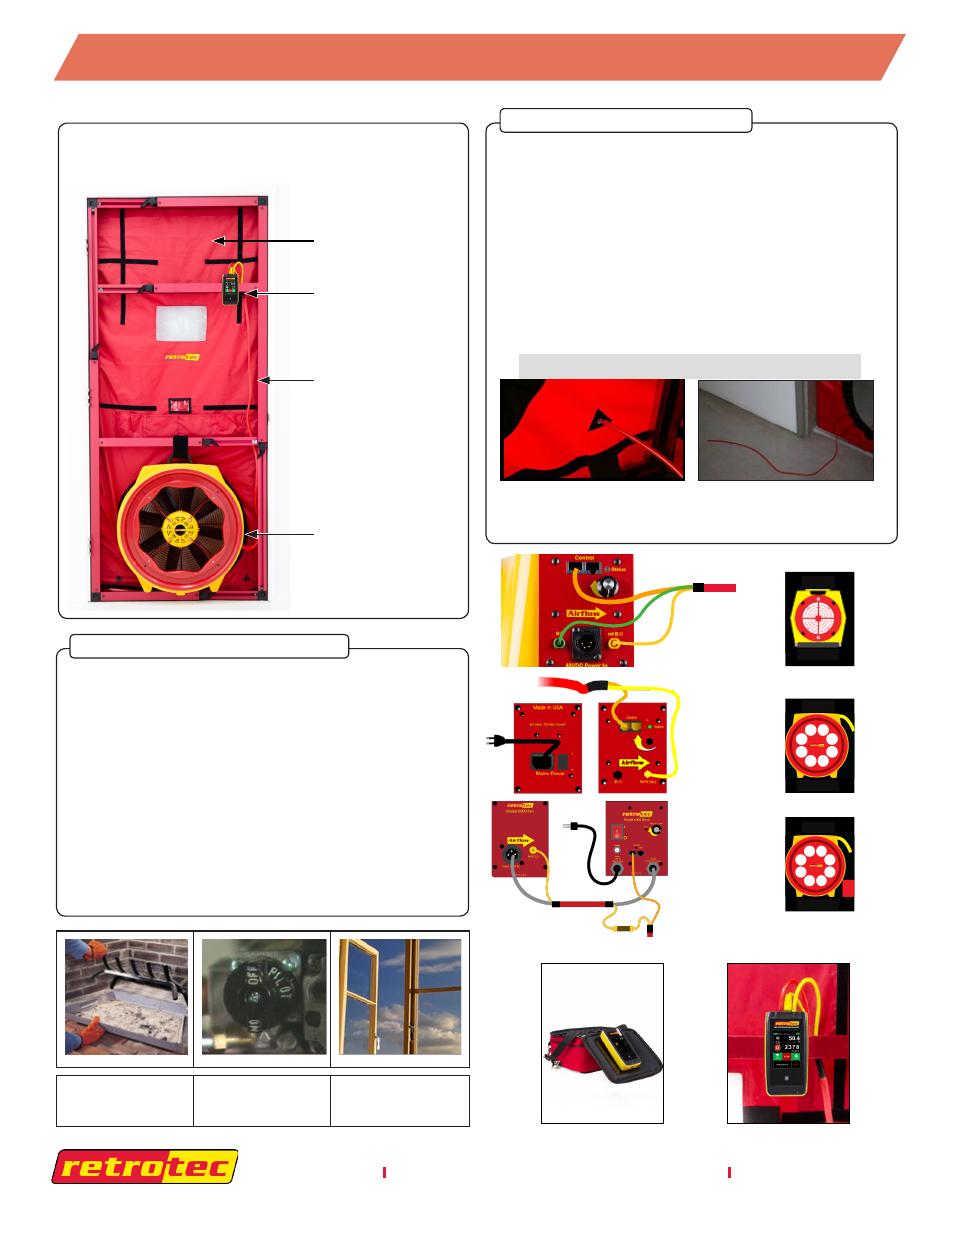 retrotec 5000 blower door with dm32 user manual 4 pages also for rh manualsdir com blower door manual retrotec blower door manual